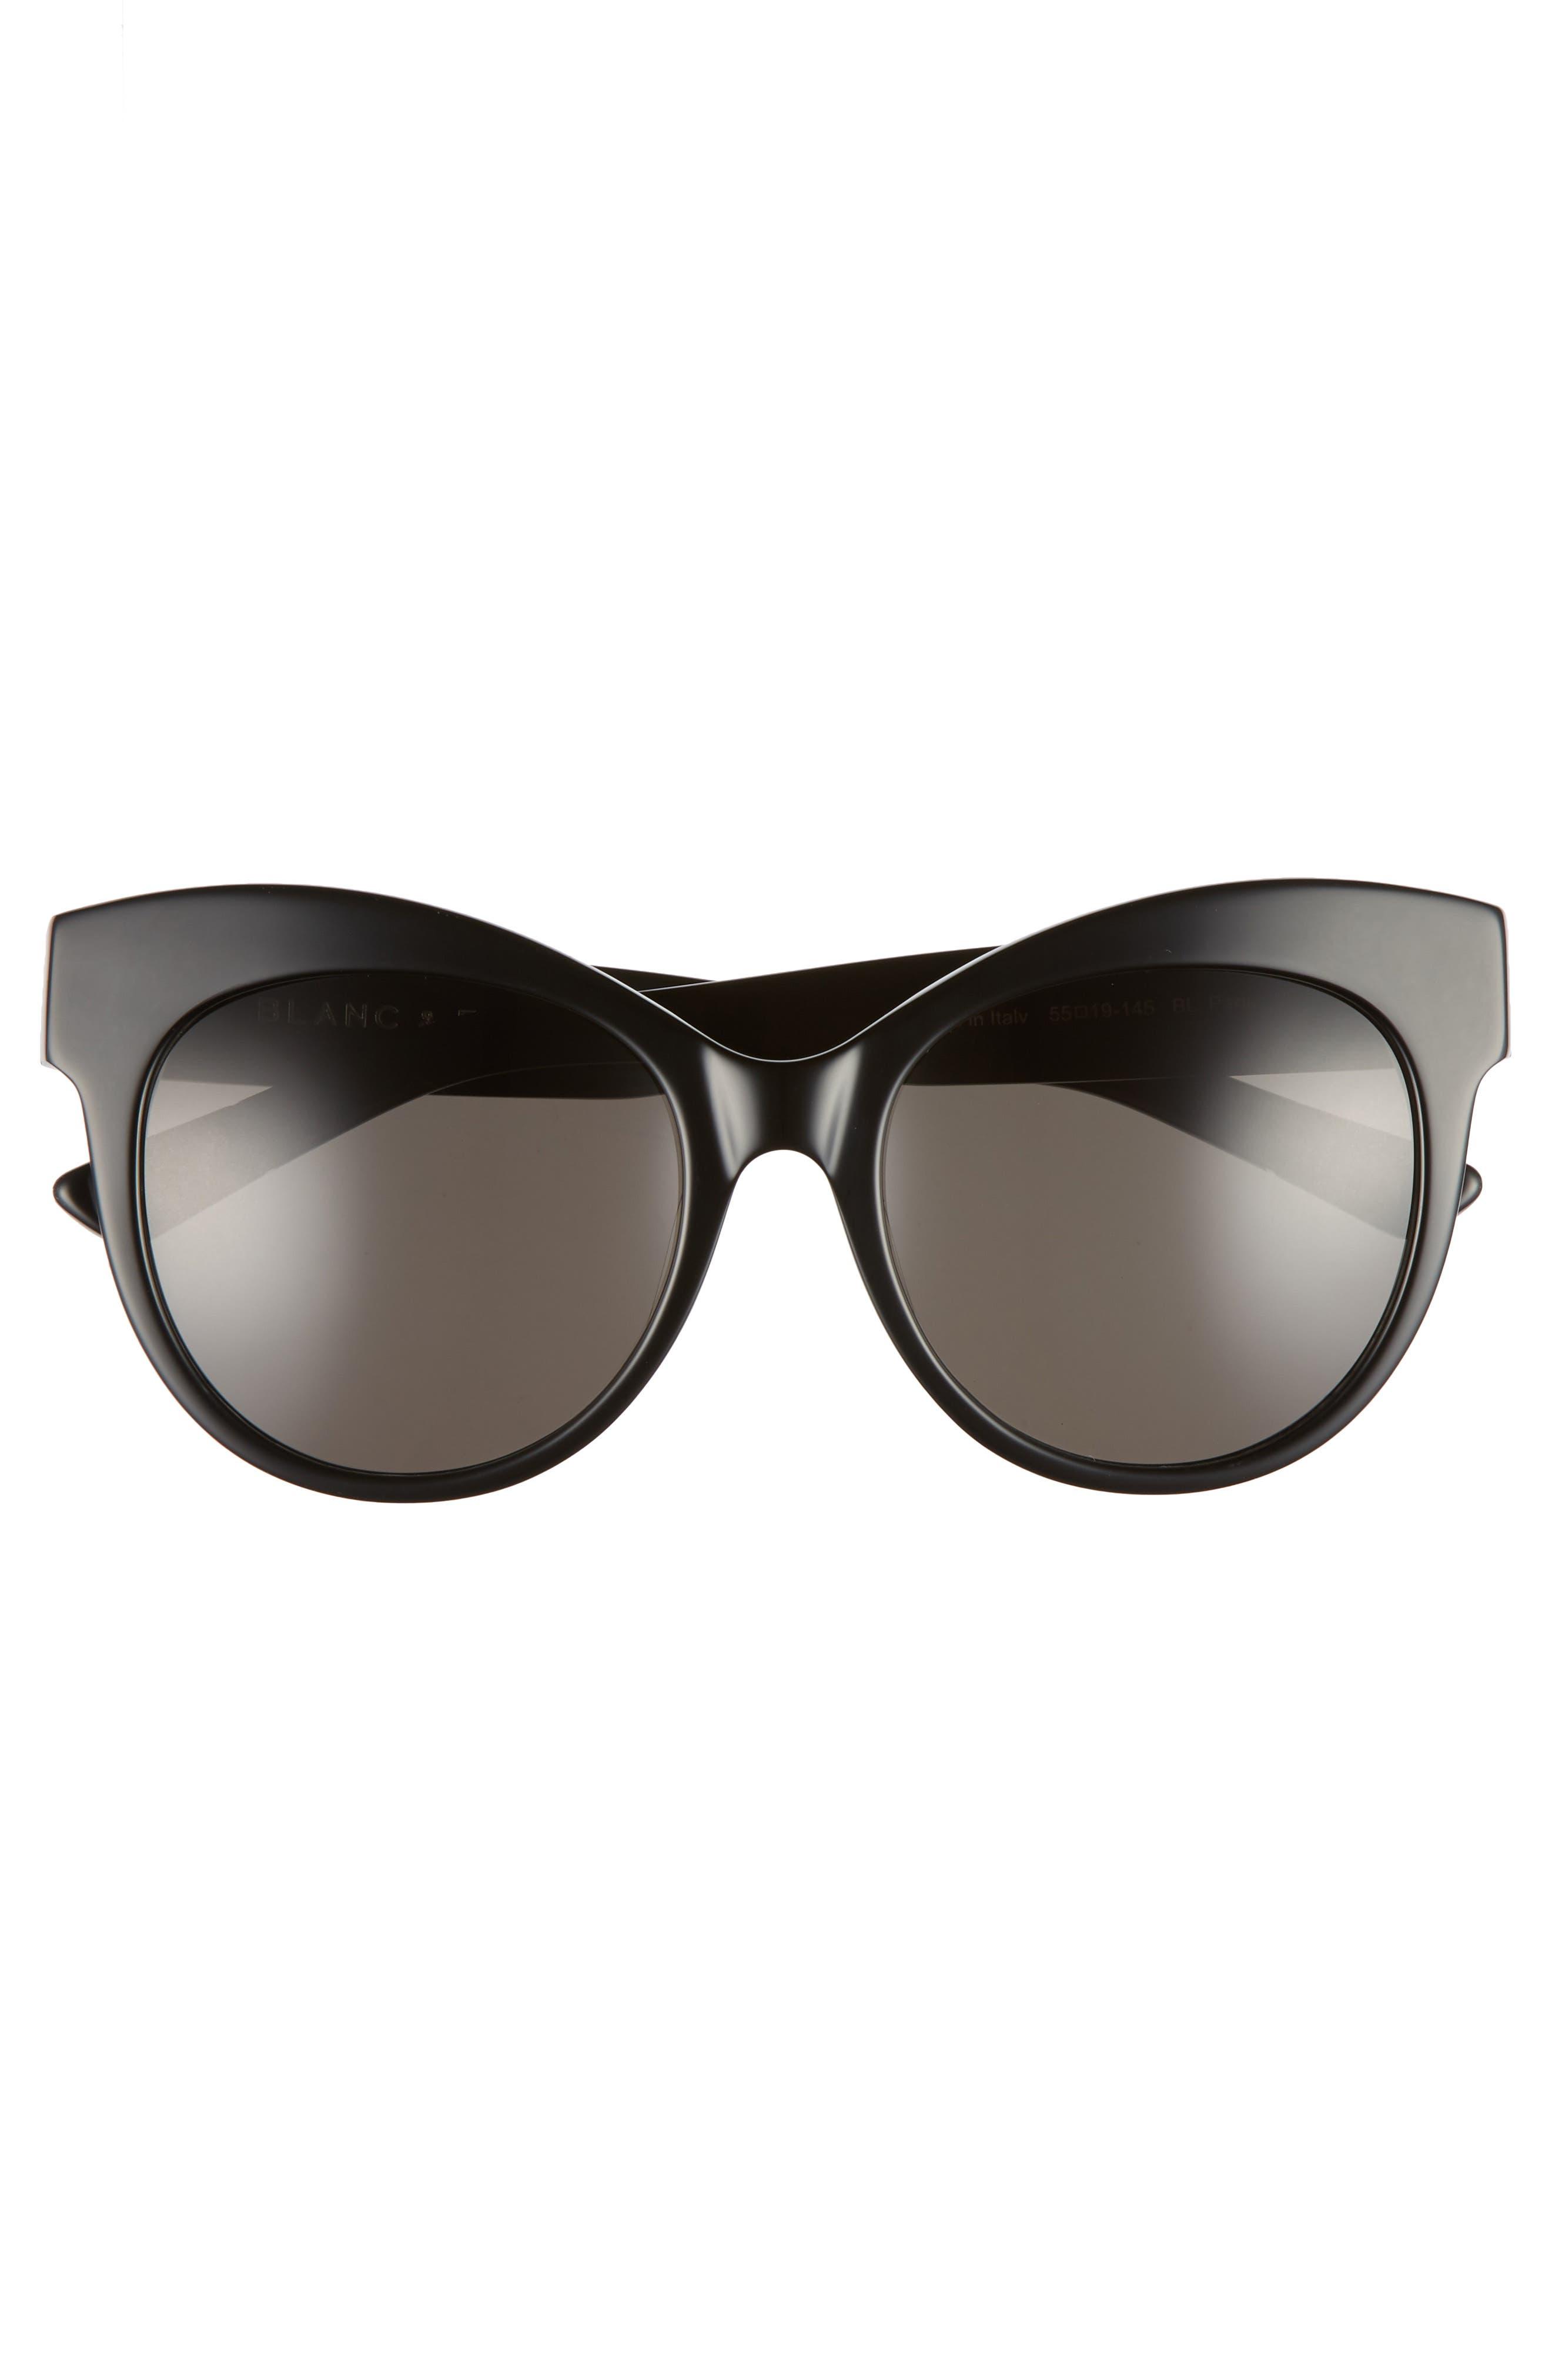 BLANC & ECLARE Paris 55mm Polarized Cat Eye Sunglasses,                             Alternate thumbnail 3, color,                             001